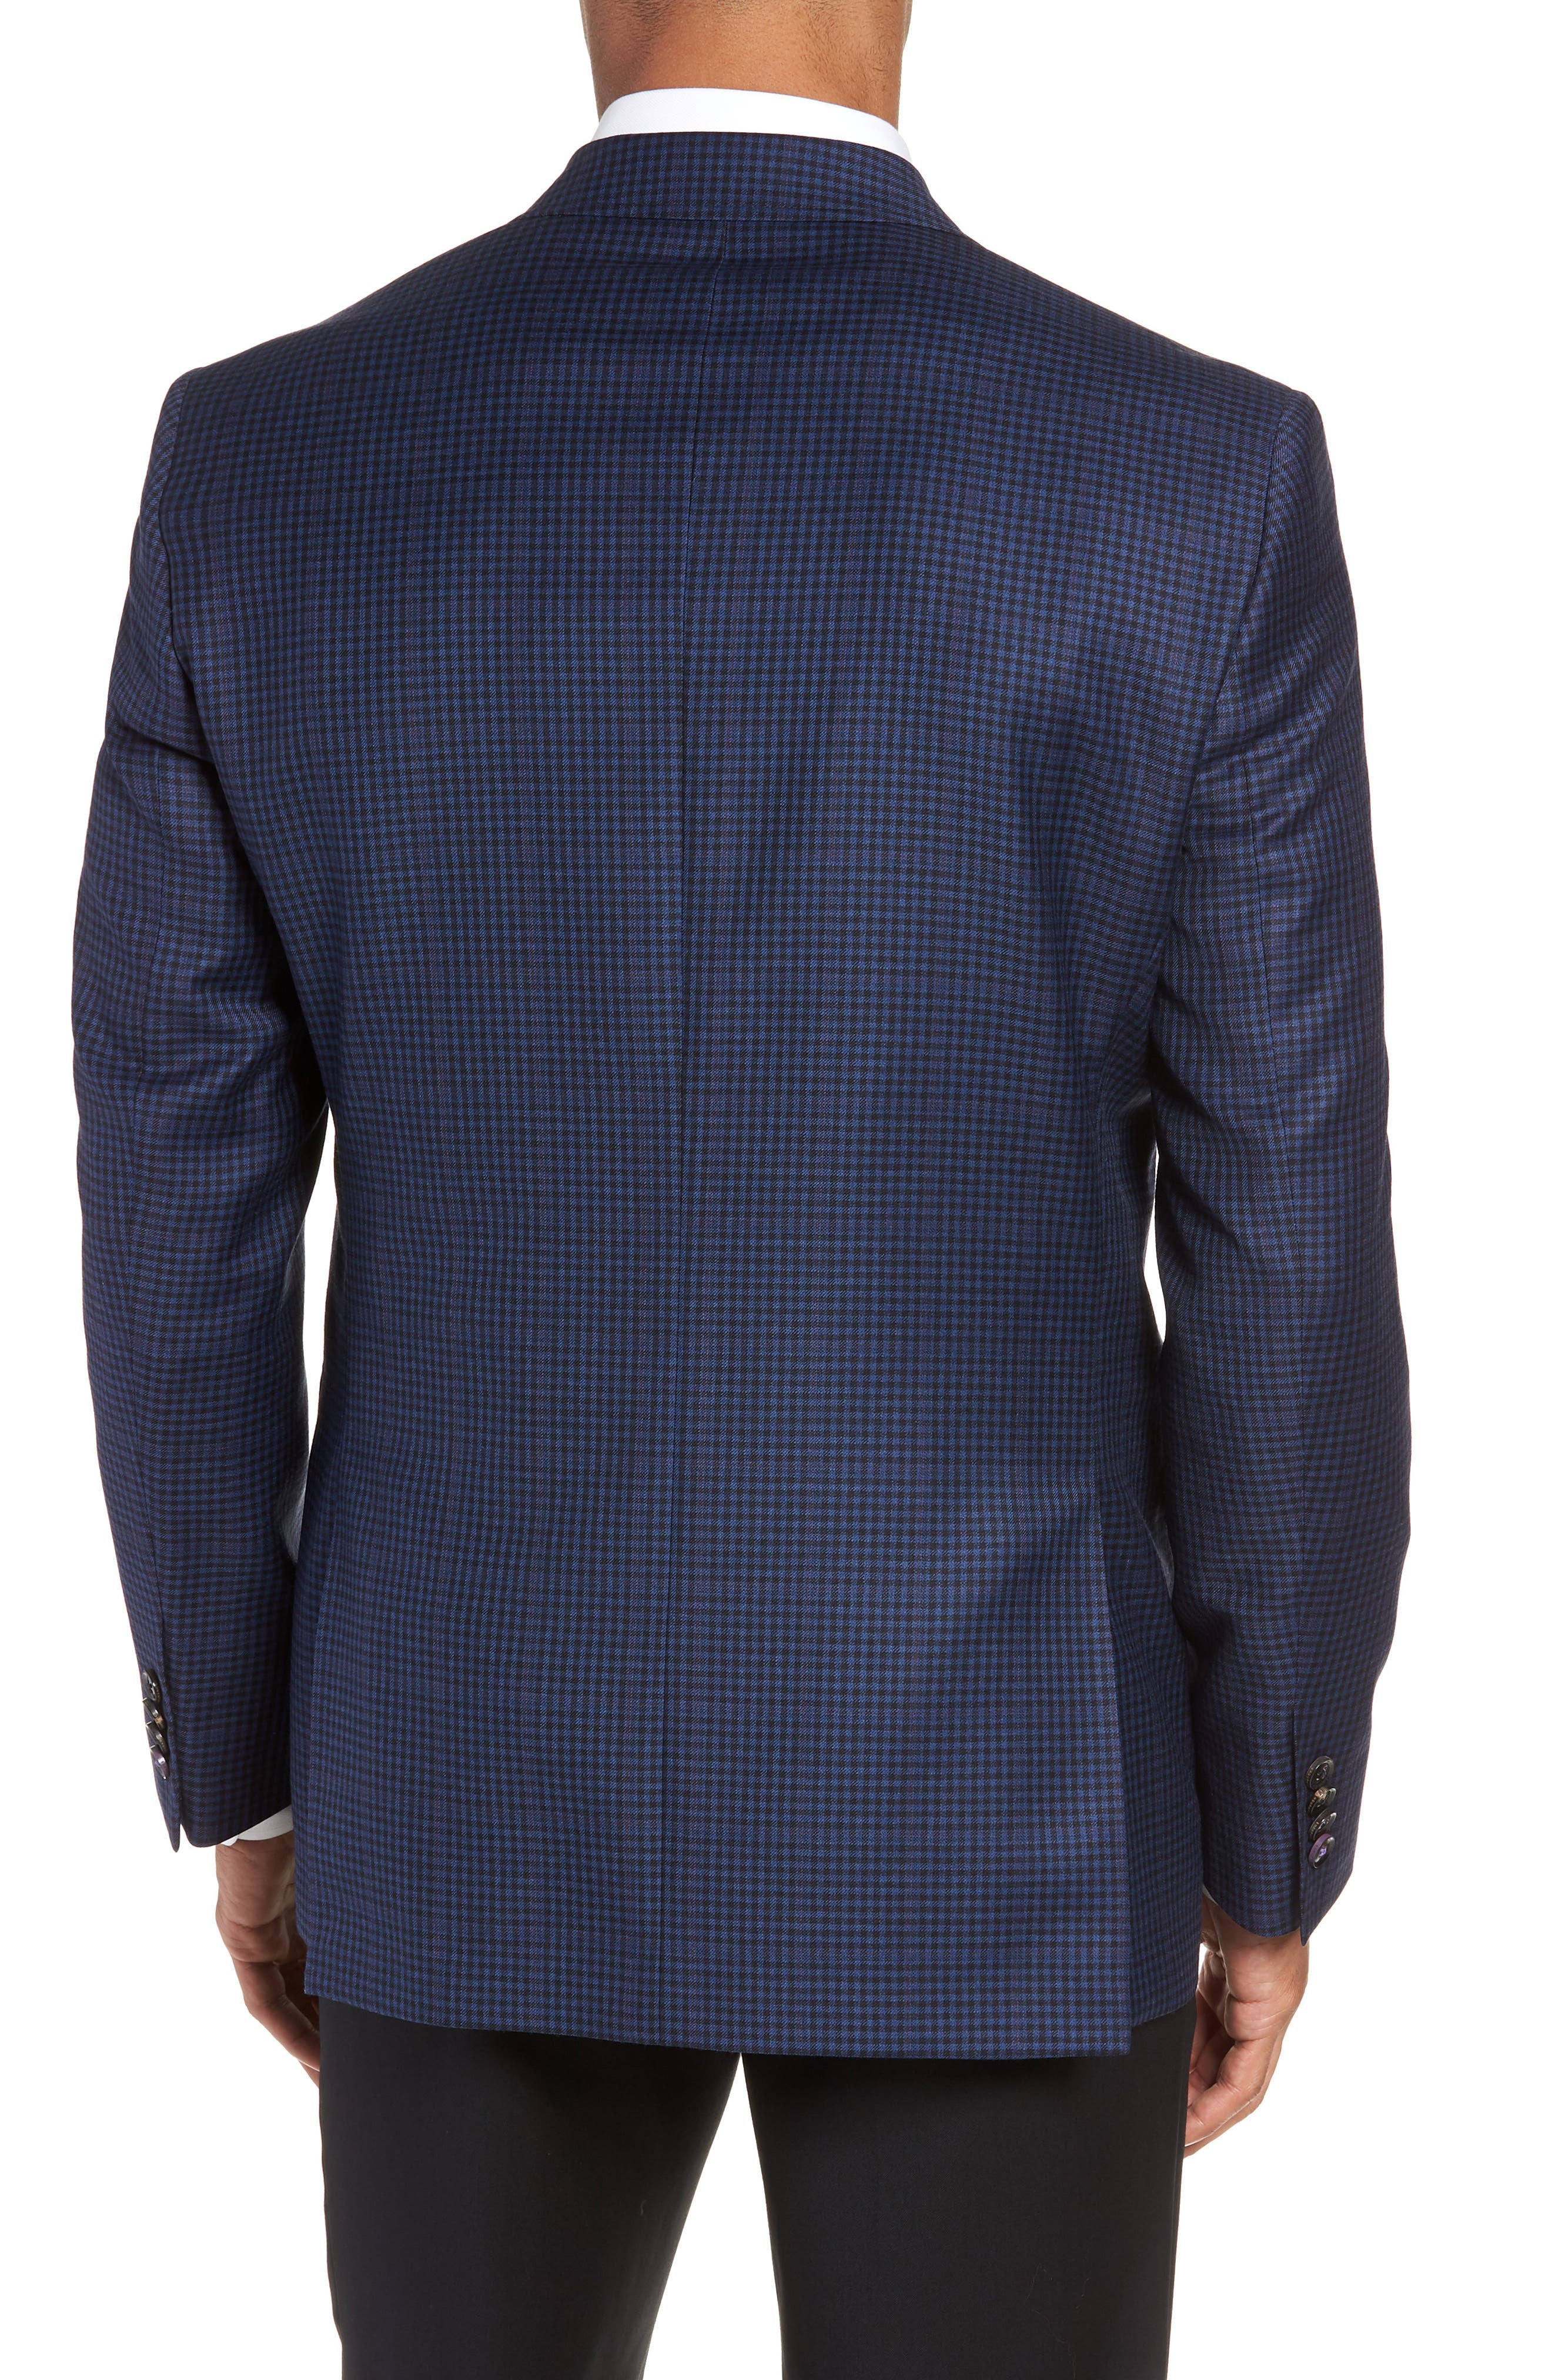 Jay 2B Trim Fit Check Wool Sport Coat,                             Alternate thumbnail 2, color,                             400